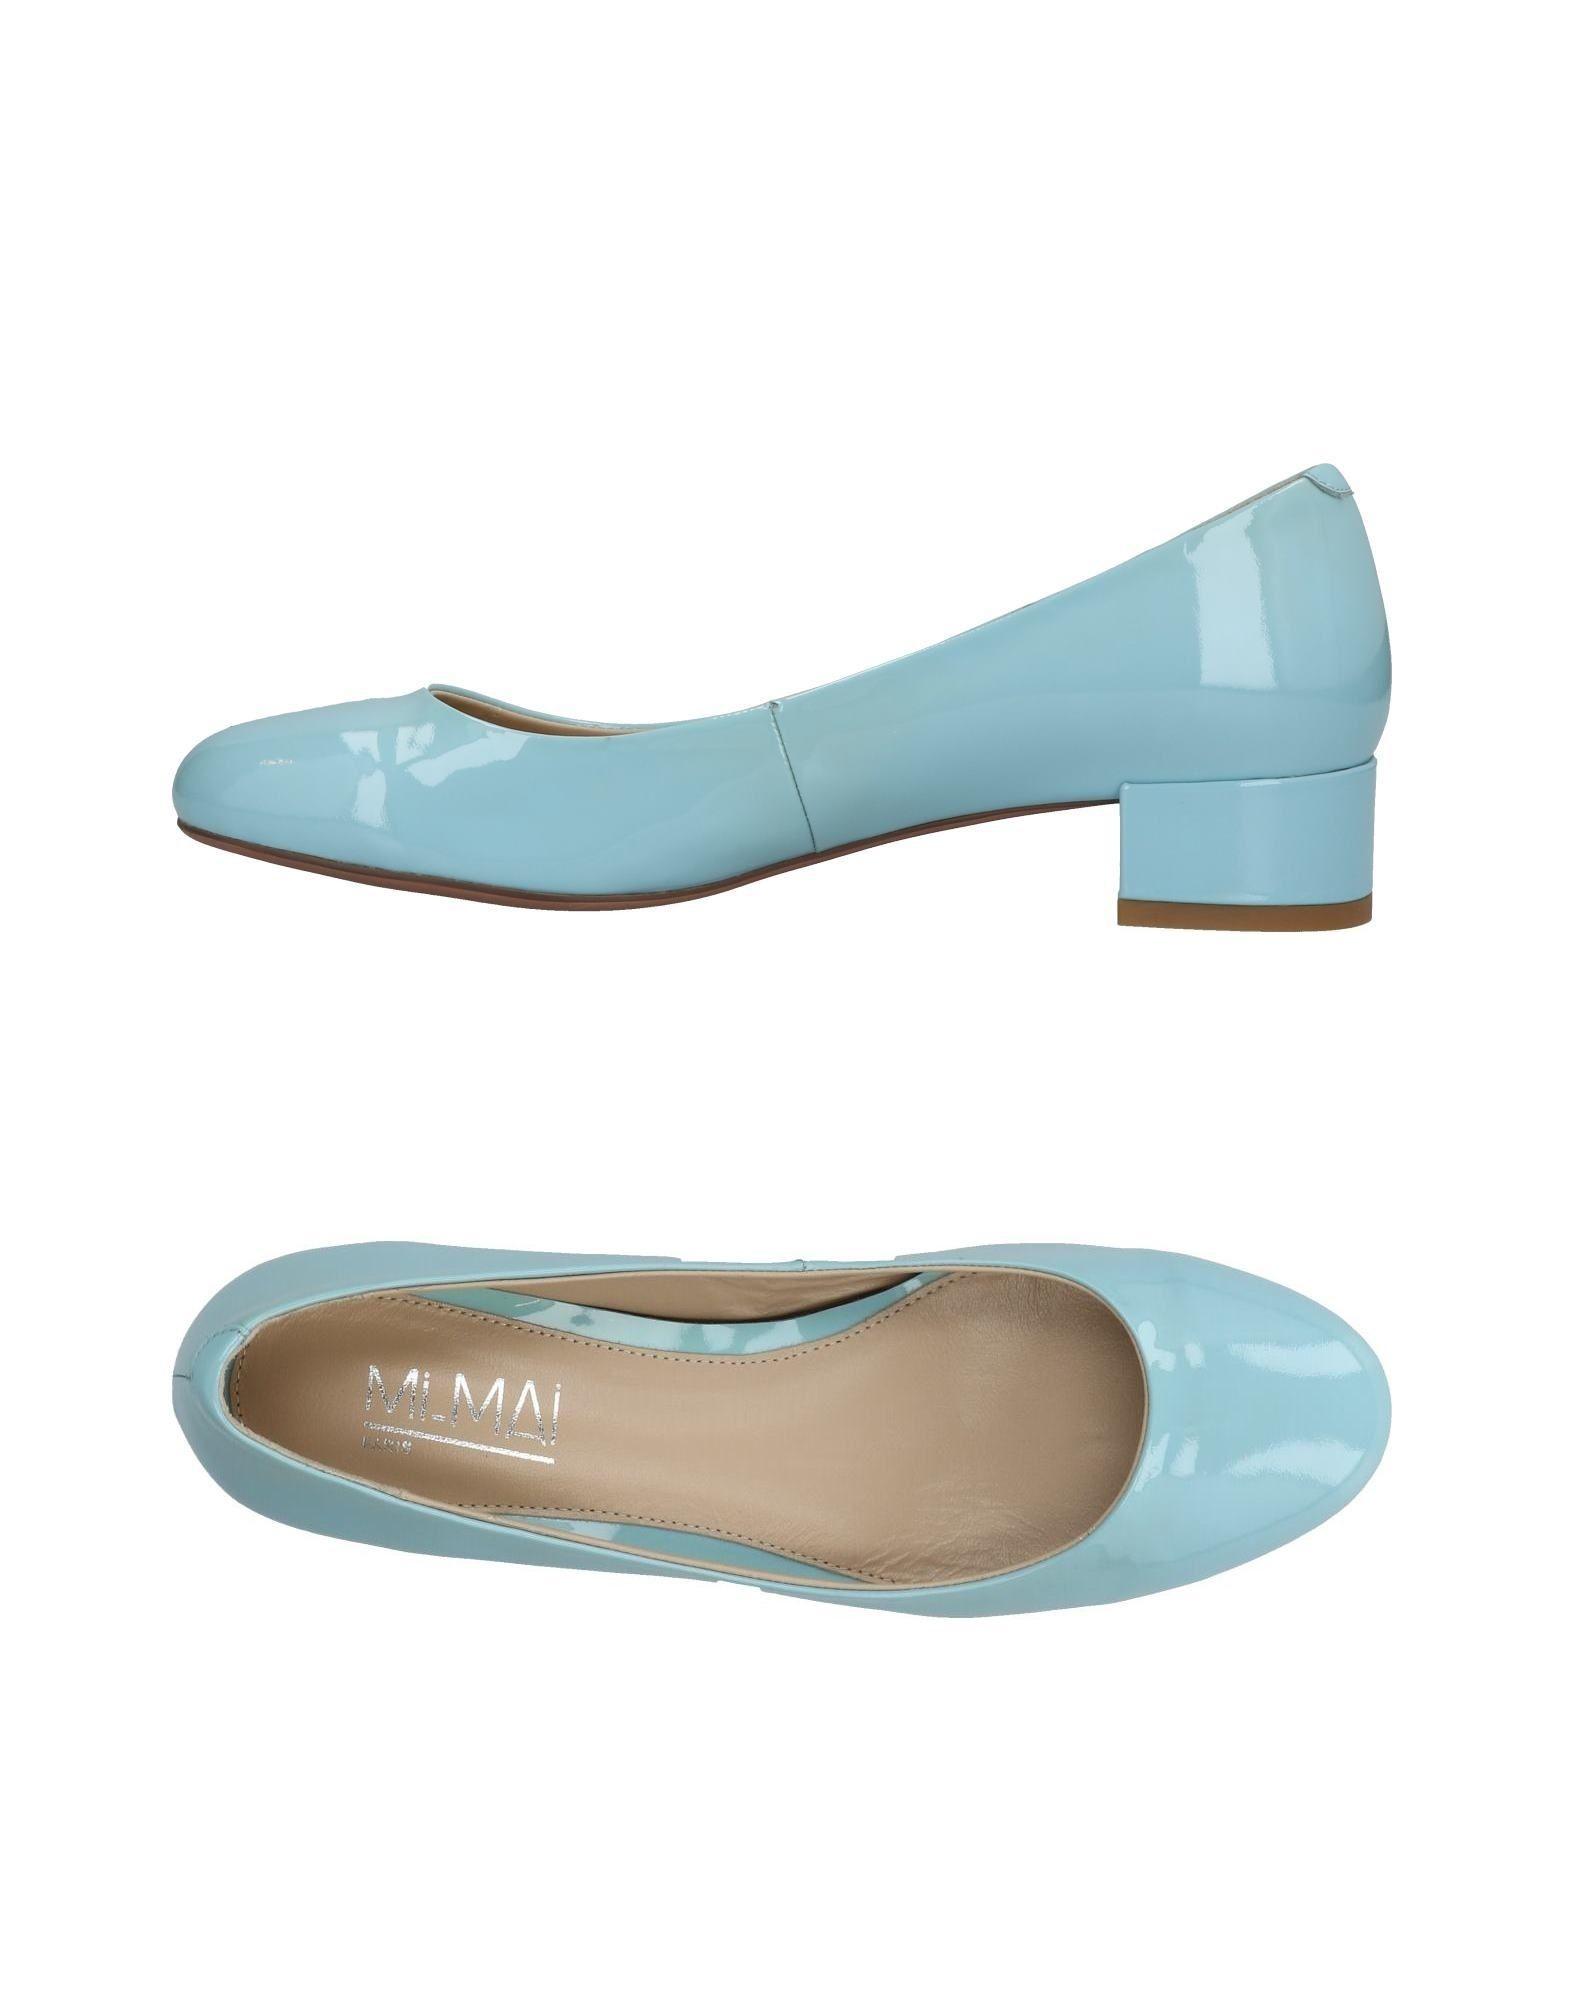 Haltbare Mode billige Schuhe Mi/Mai Pumps Damen  11408231LW Heiße Schuhe